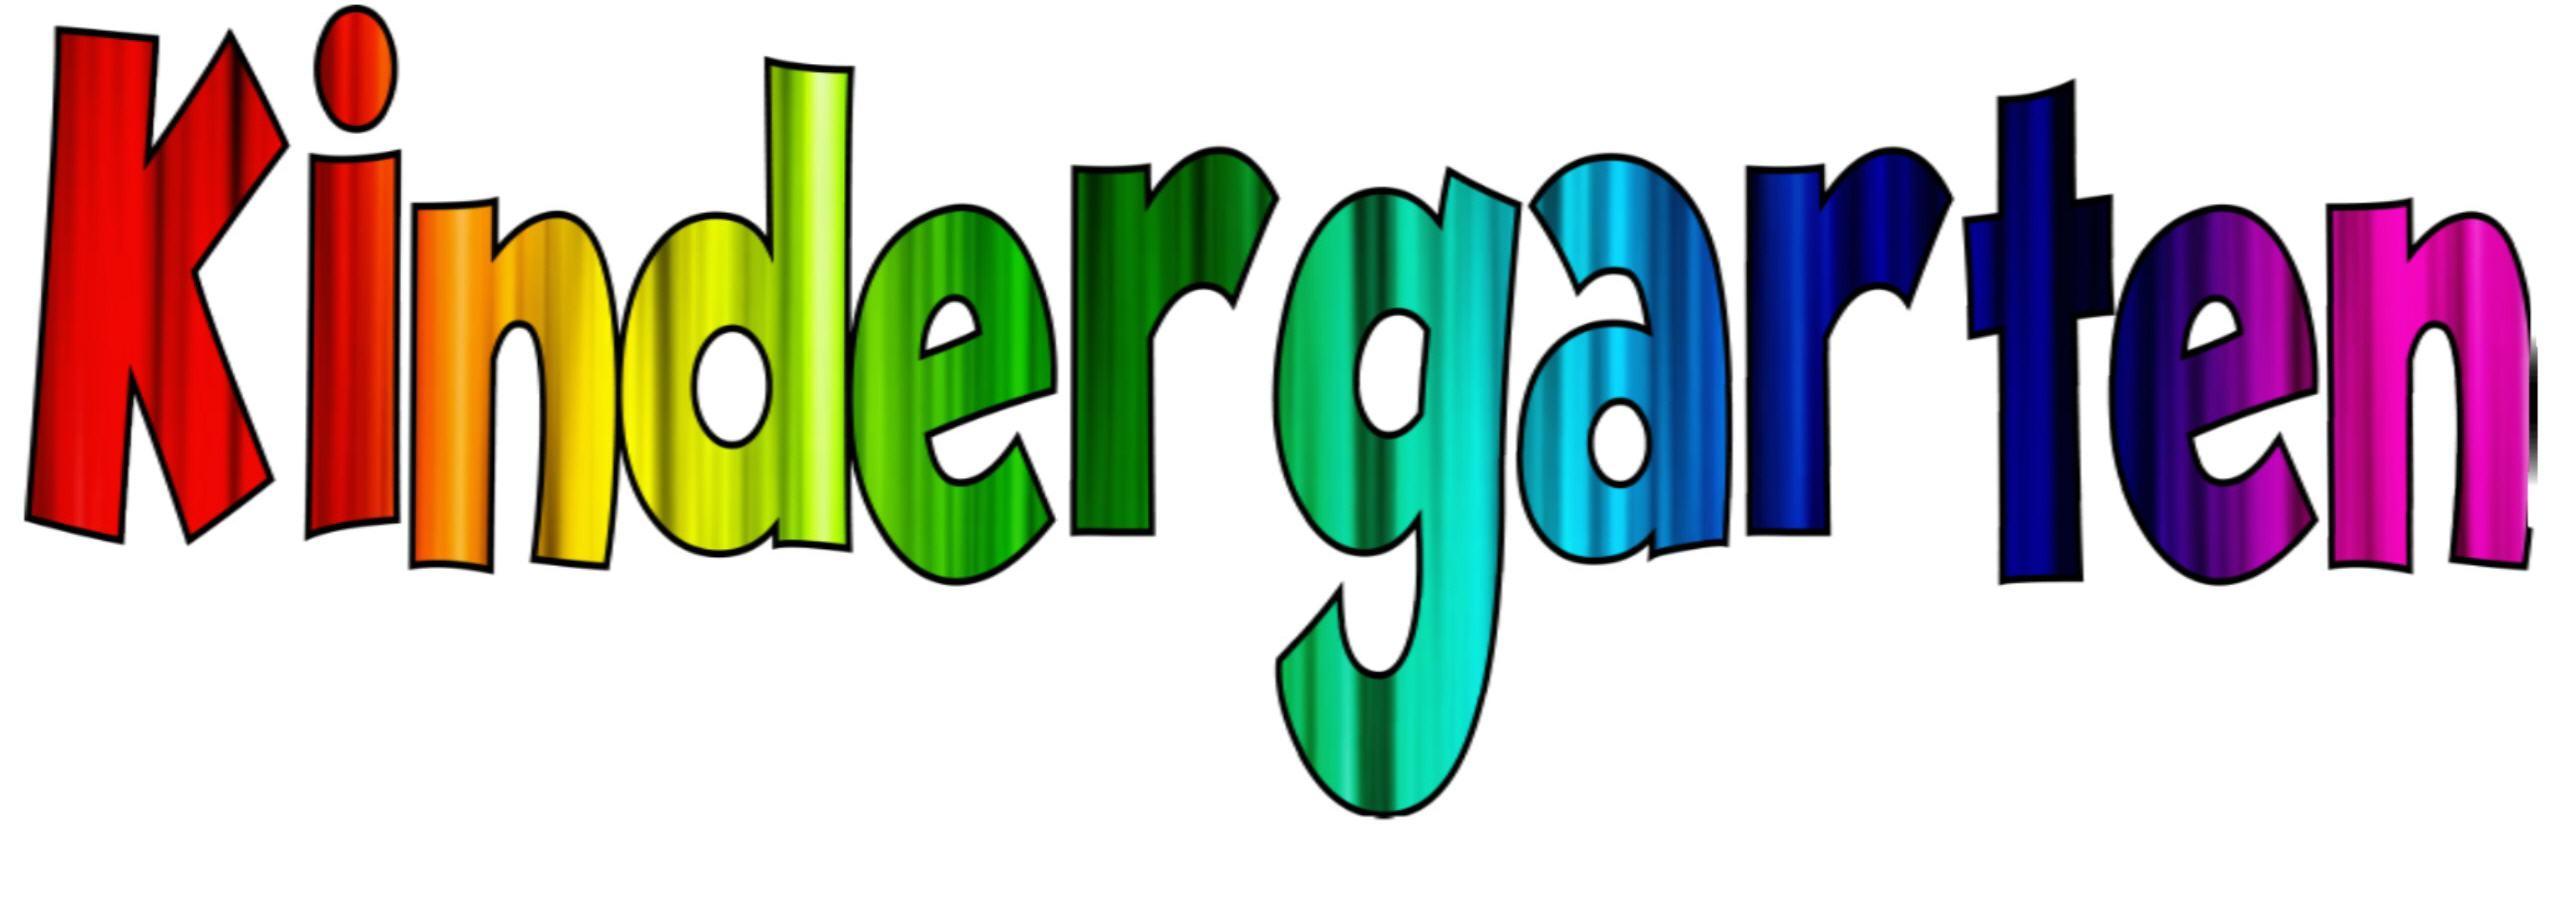 Kindergarten clip art blog clipart free images image 2